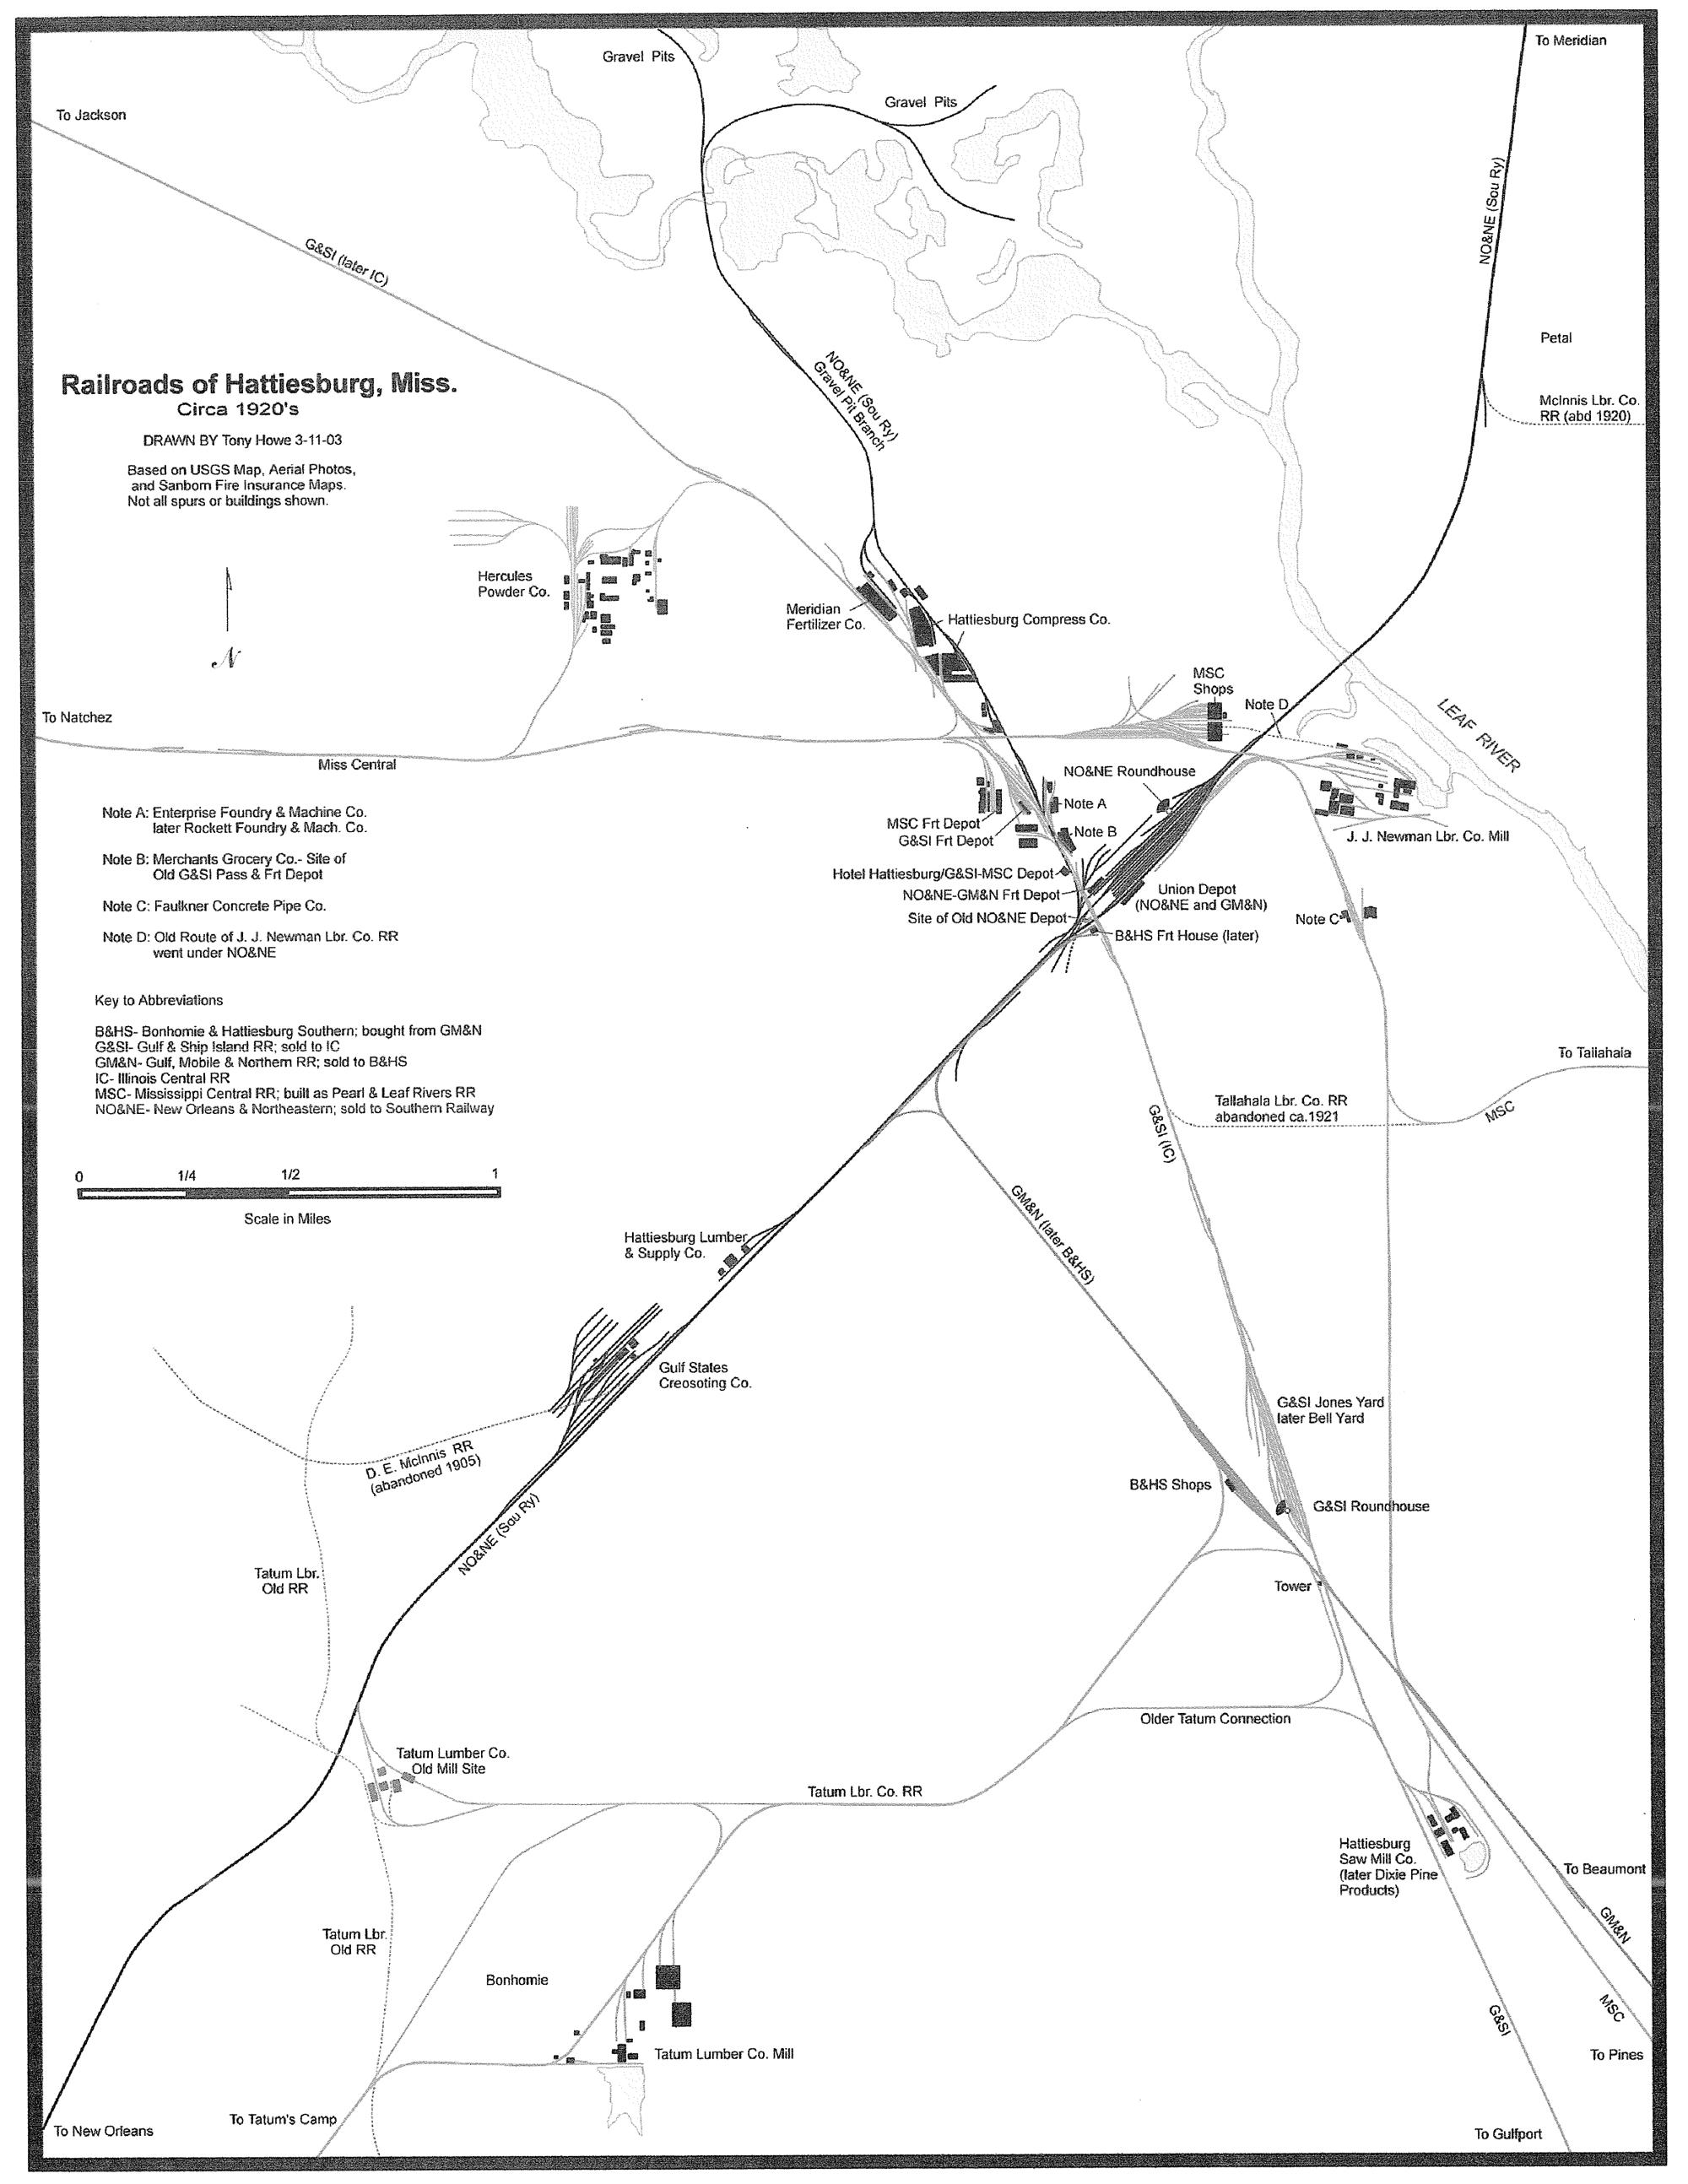 HawkinsRails - Bonhomie & Hattiesburgh Southern